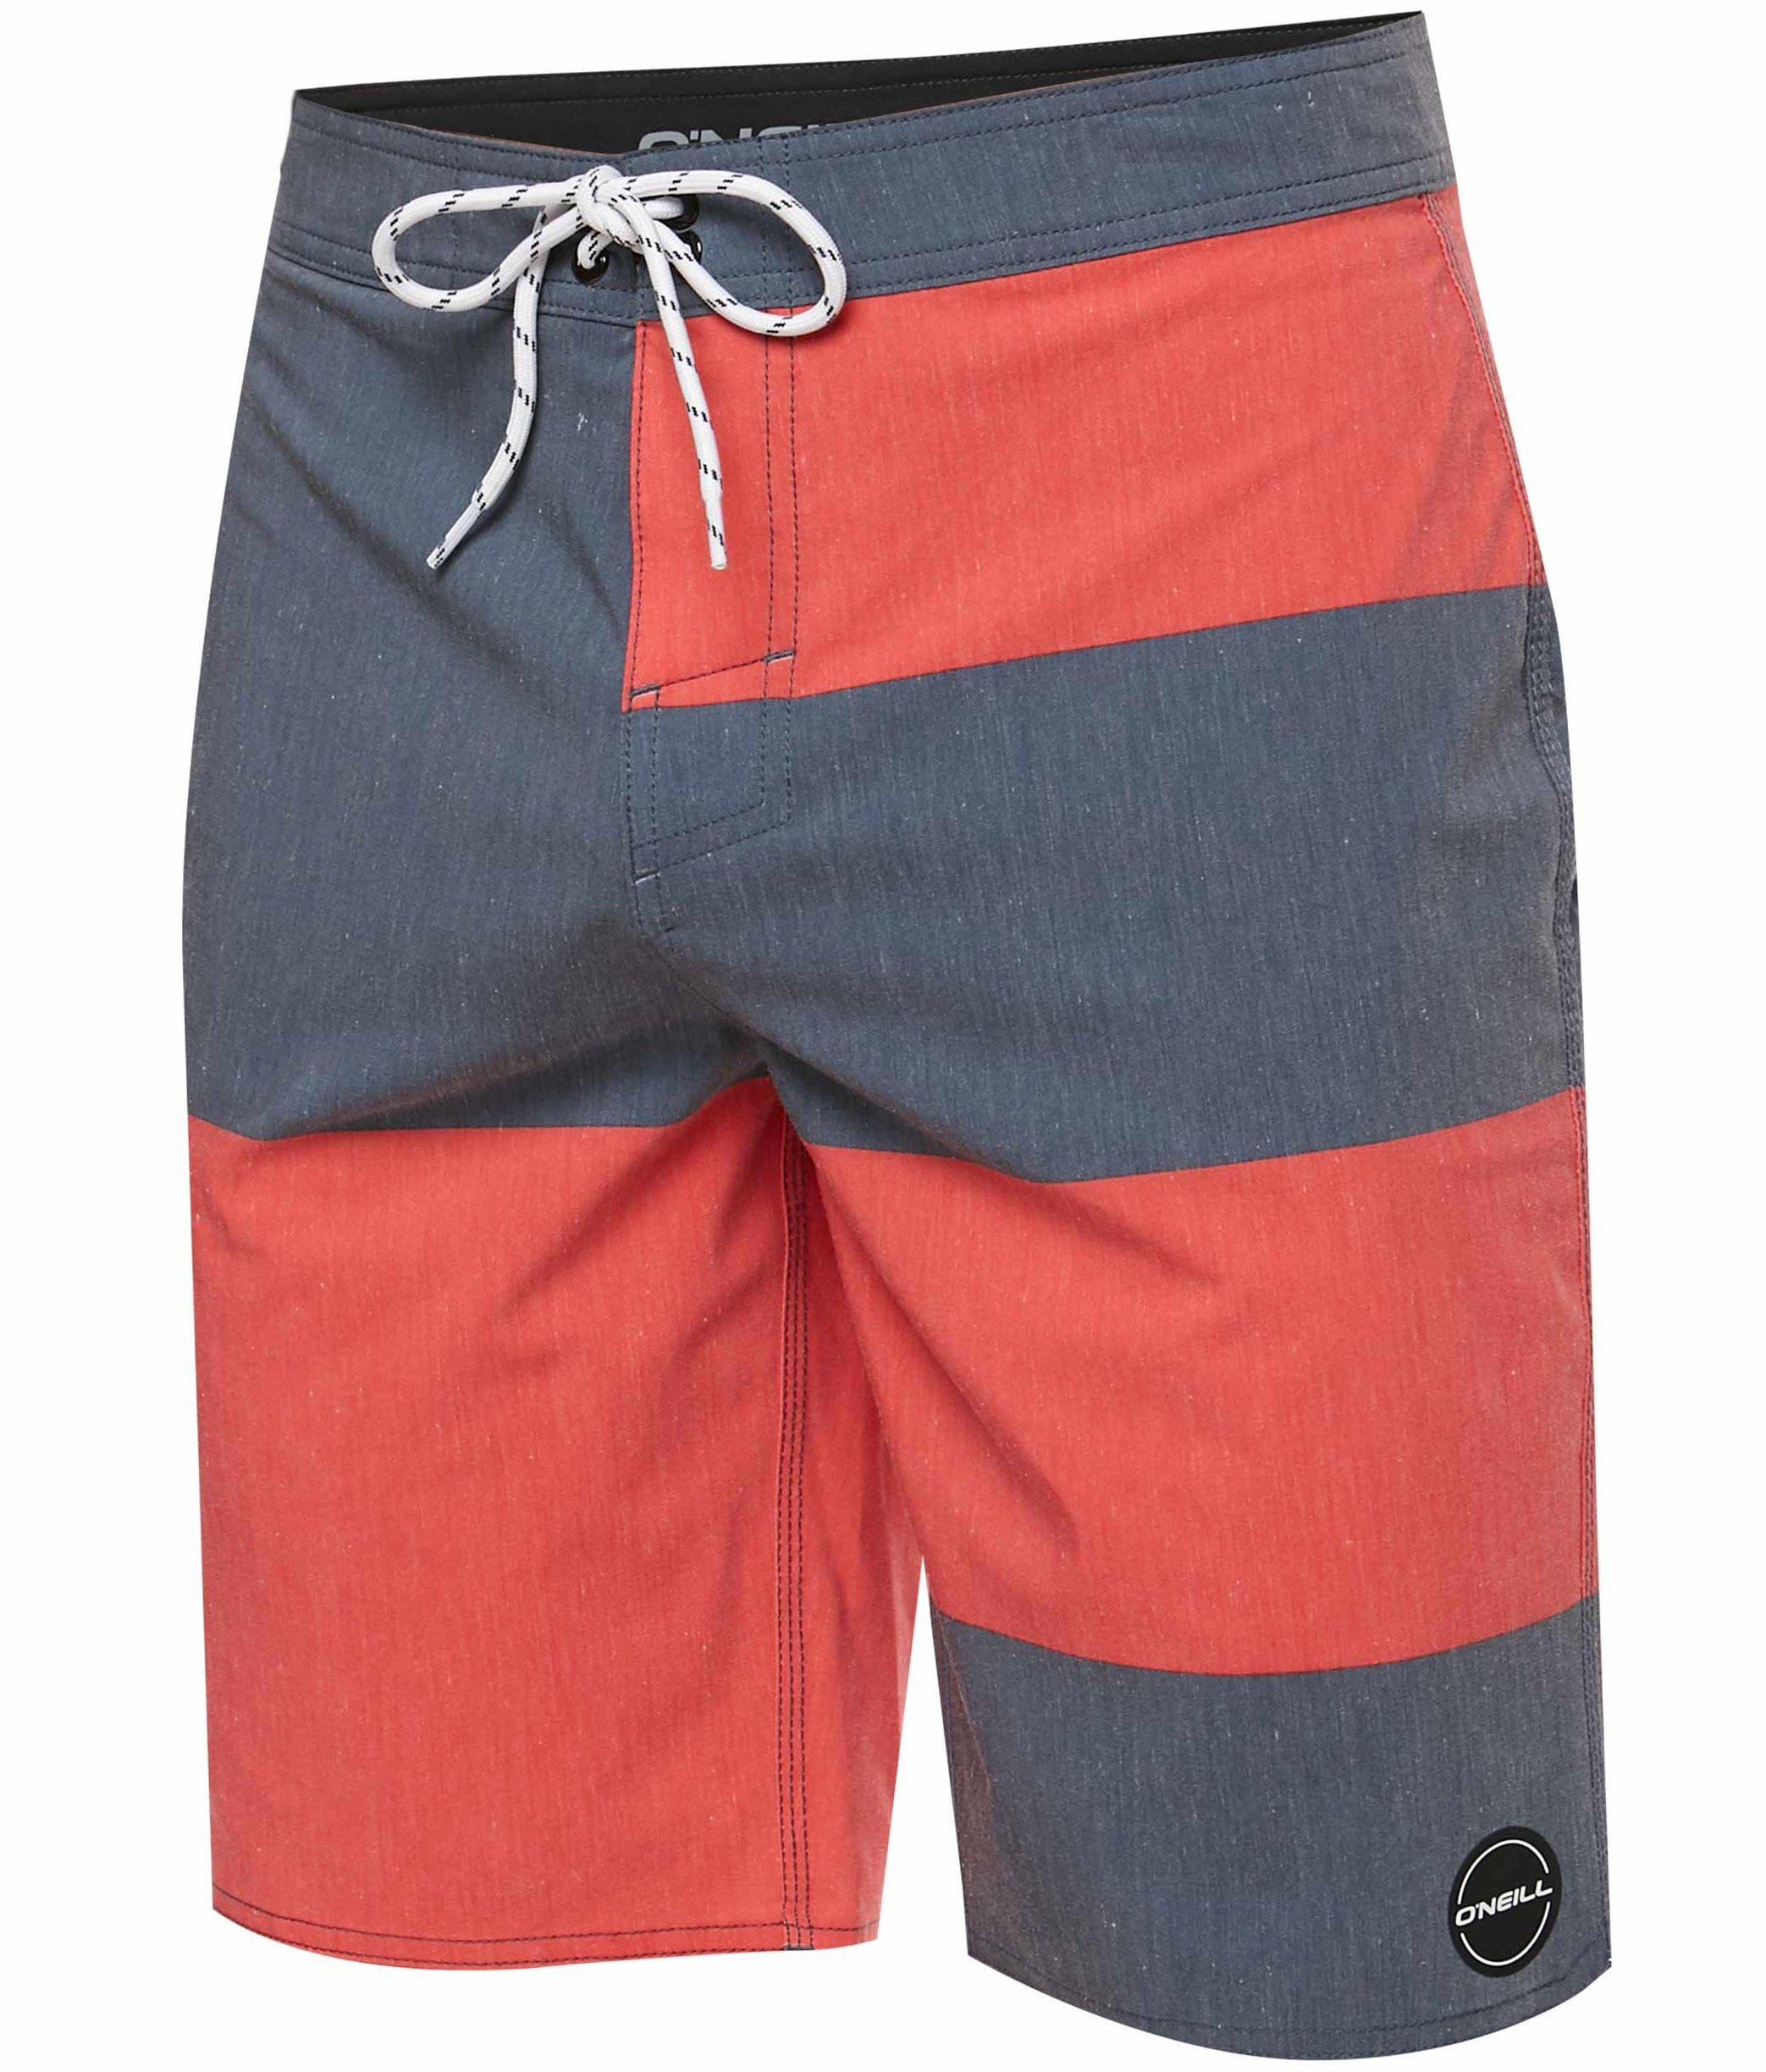 O'Neill Men's Hyperfreak Heist Informant Boardshort - Informant Red, Size 34 by O'Neill (Image #1)